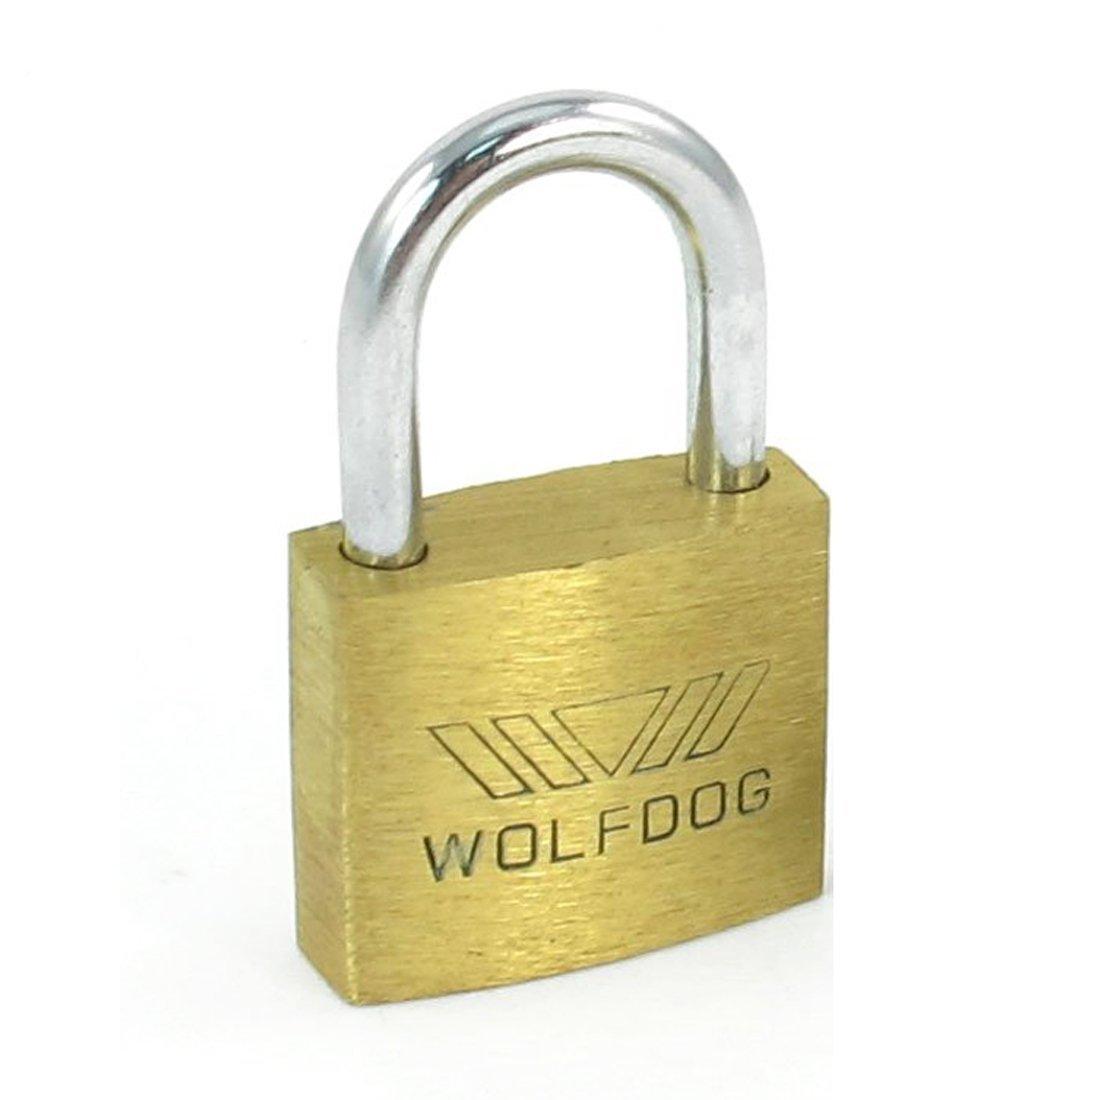 Candado de laton WOLFDOG candado de laton bloqueo de puerta de seguridad de anchura de 20mm de mini tamano con 3 llaves